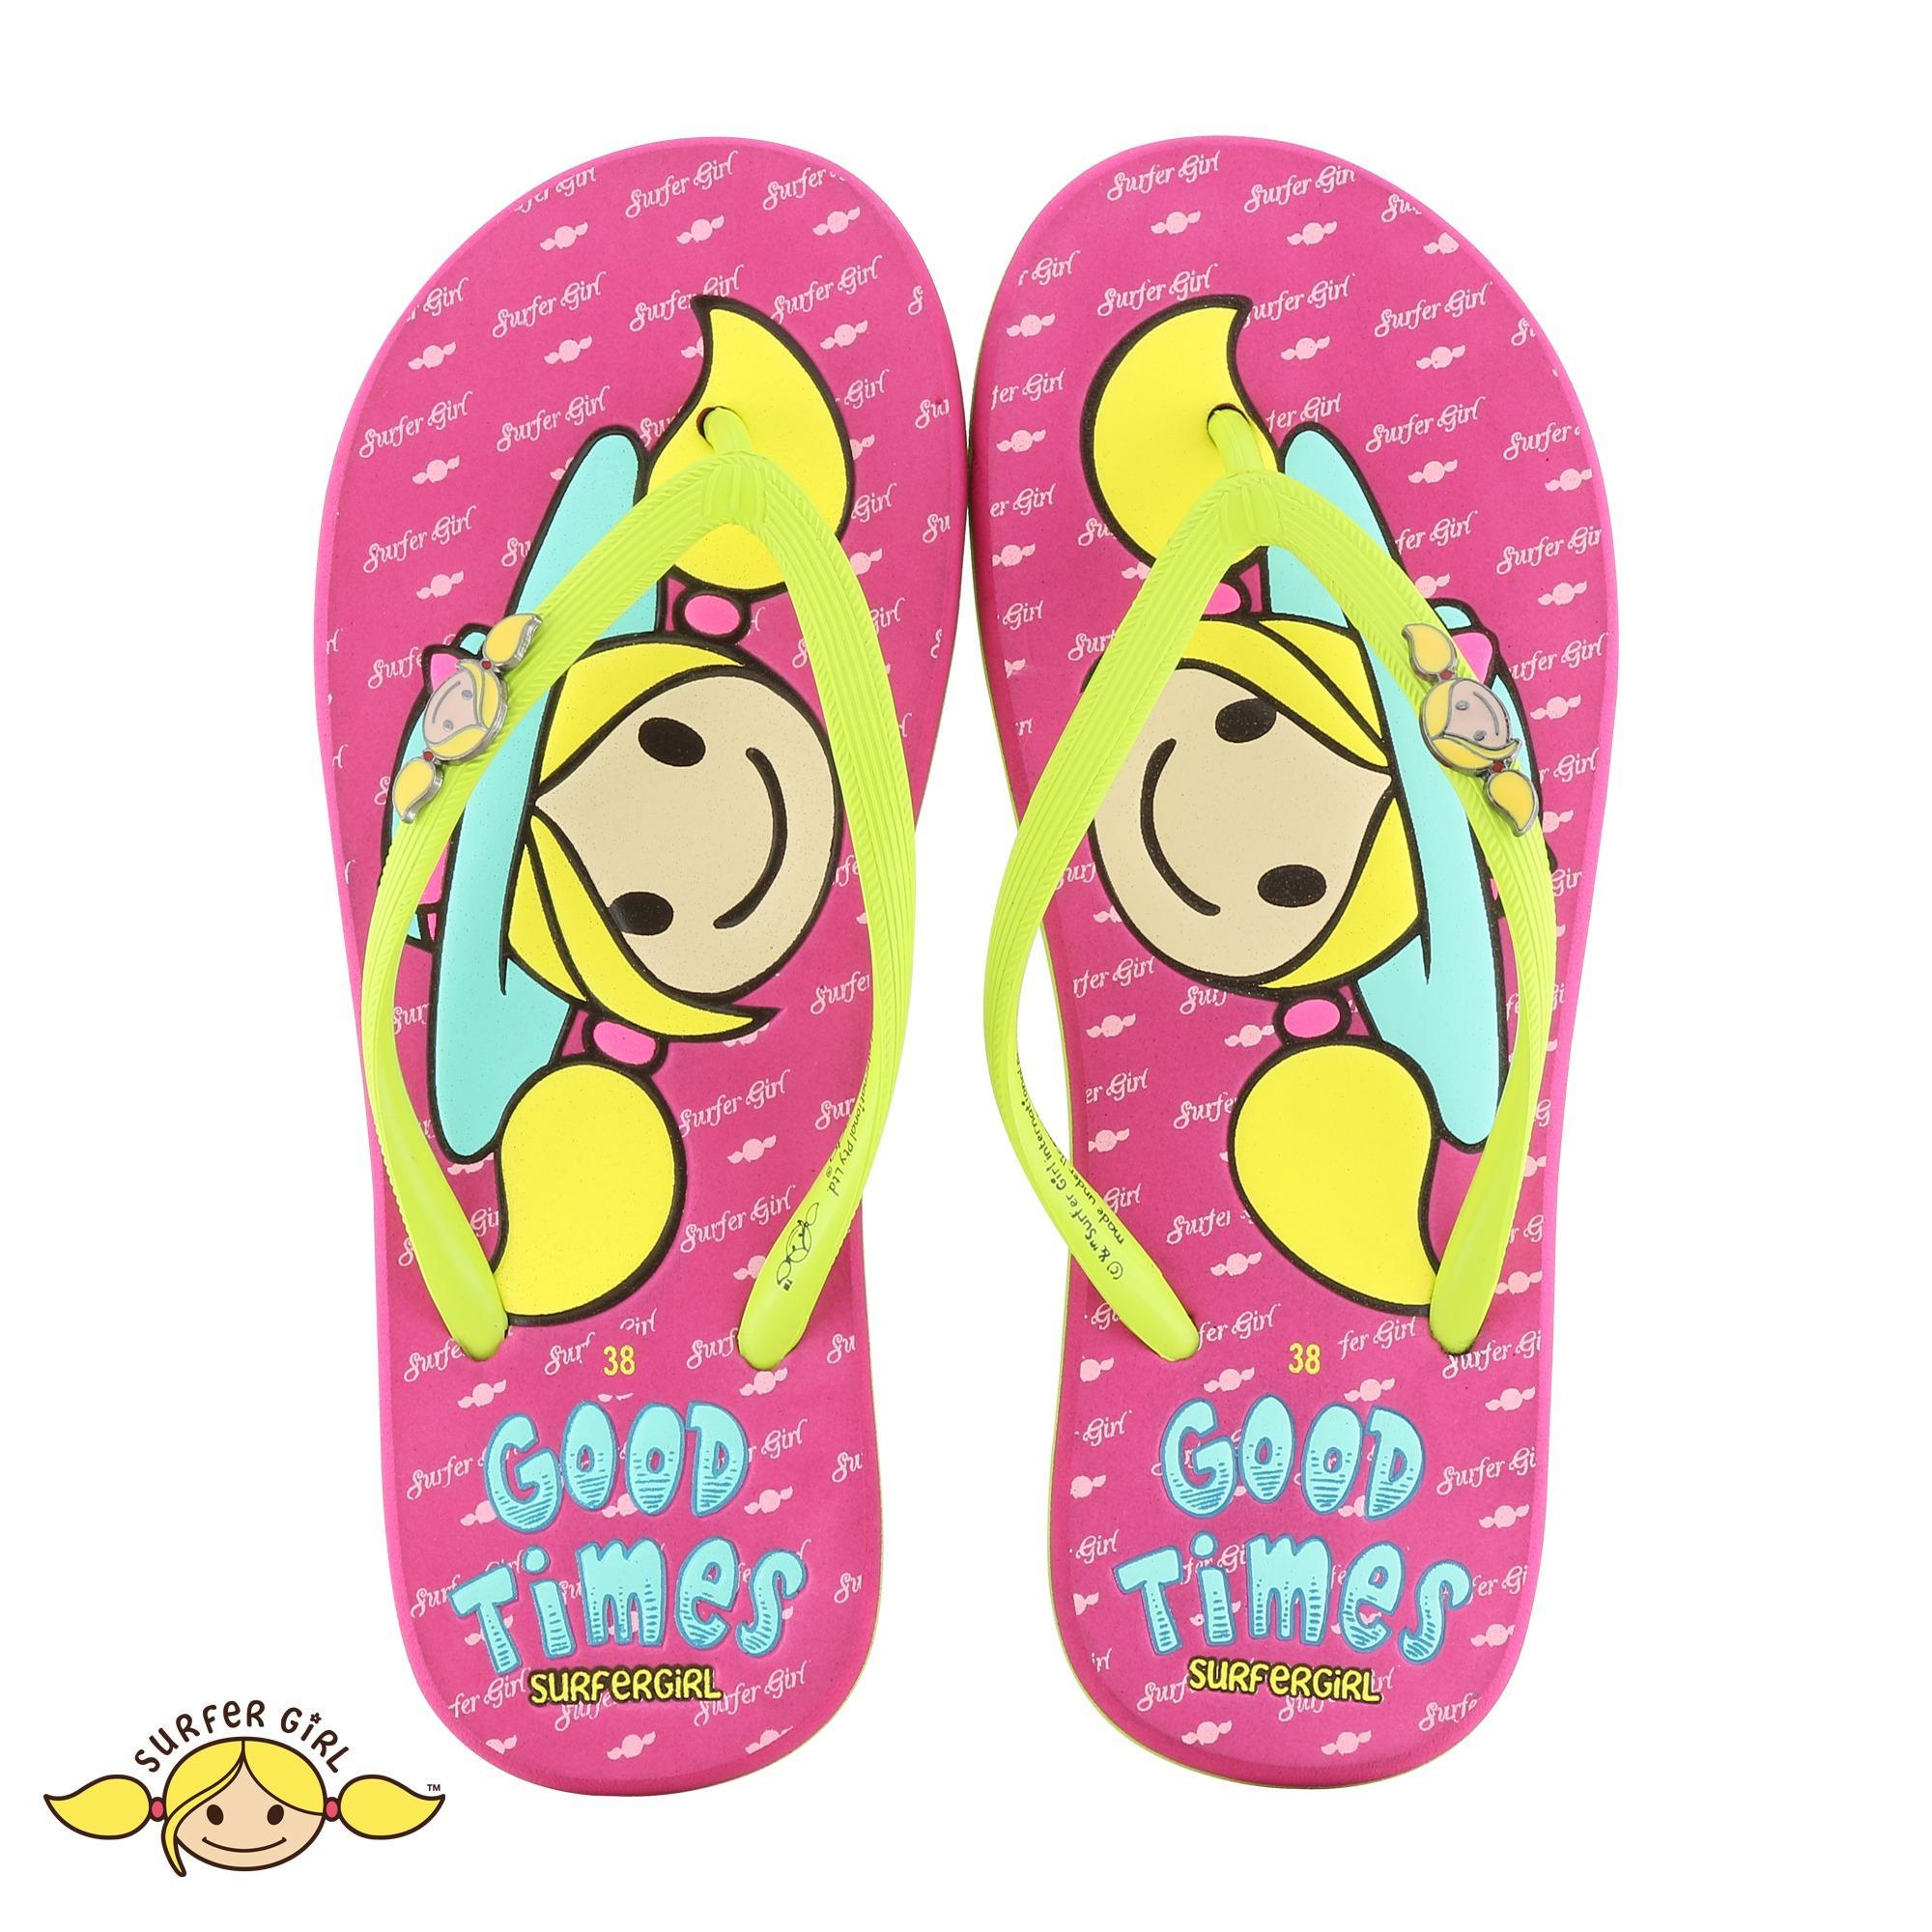 Beli Sandal Flip Flop Surfer G*rl Limited Edition Sgl 481 Lime Fusia Online Murah